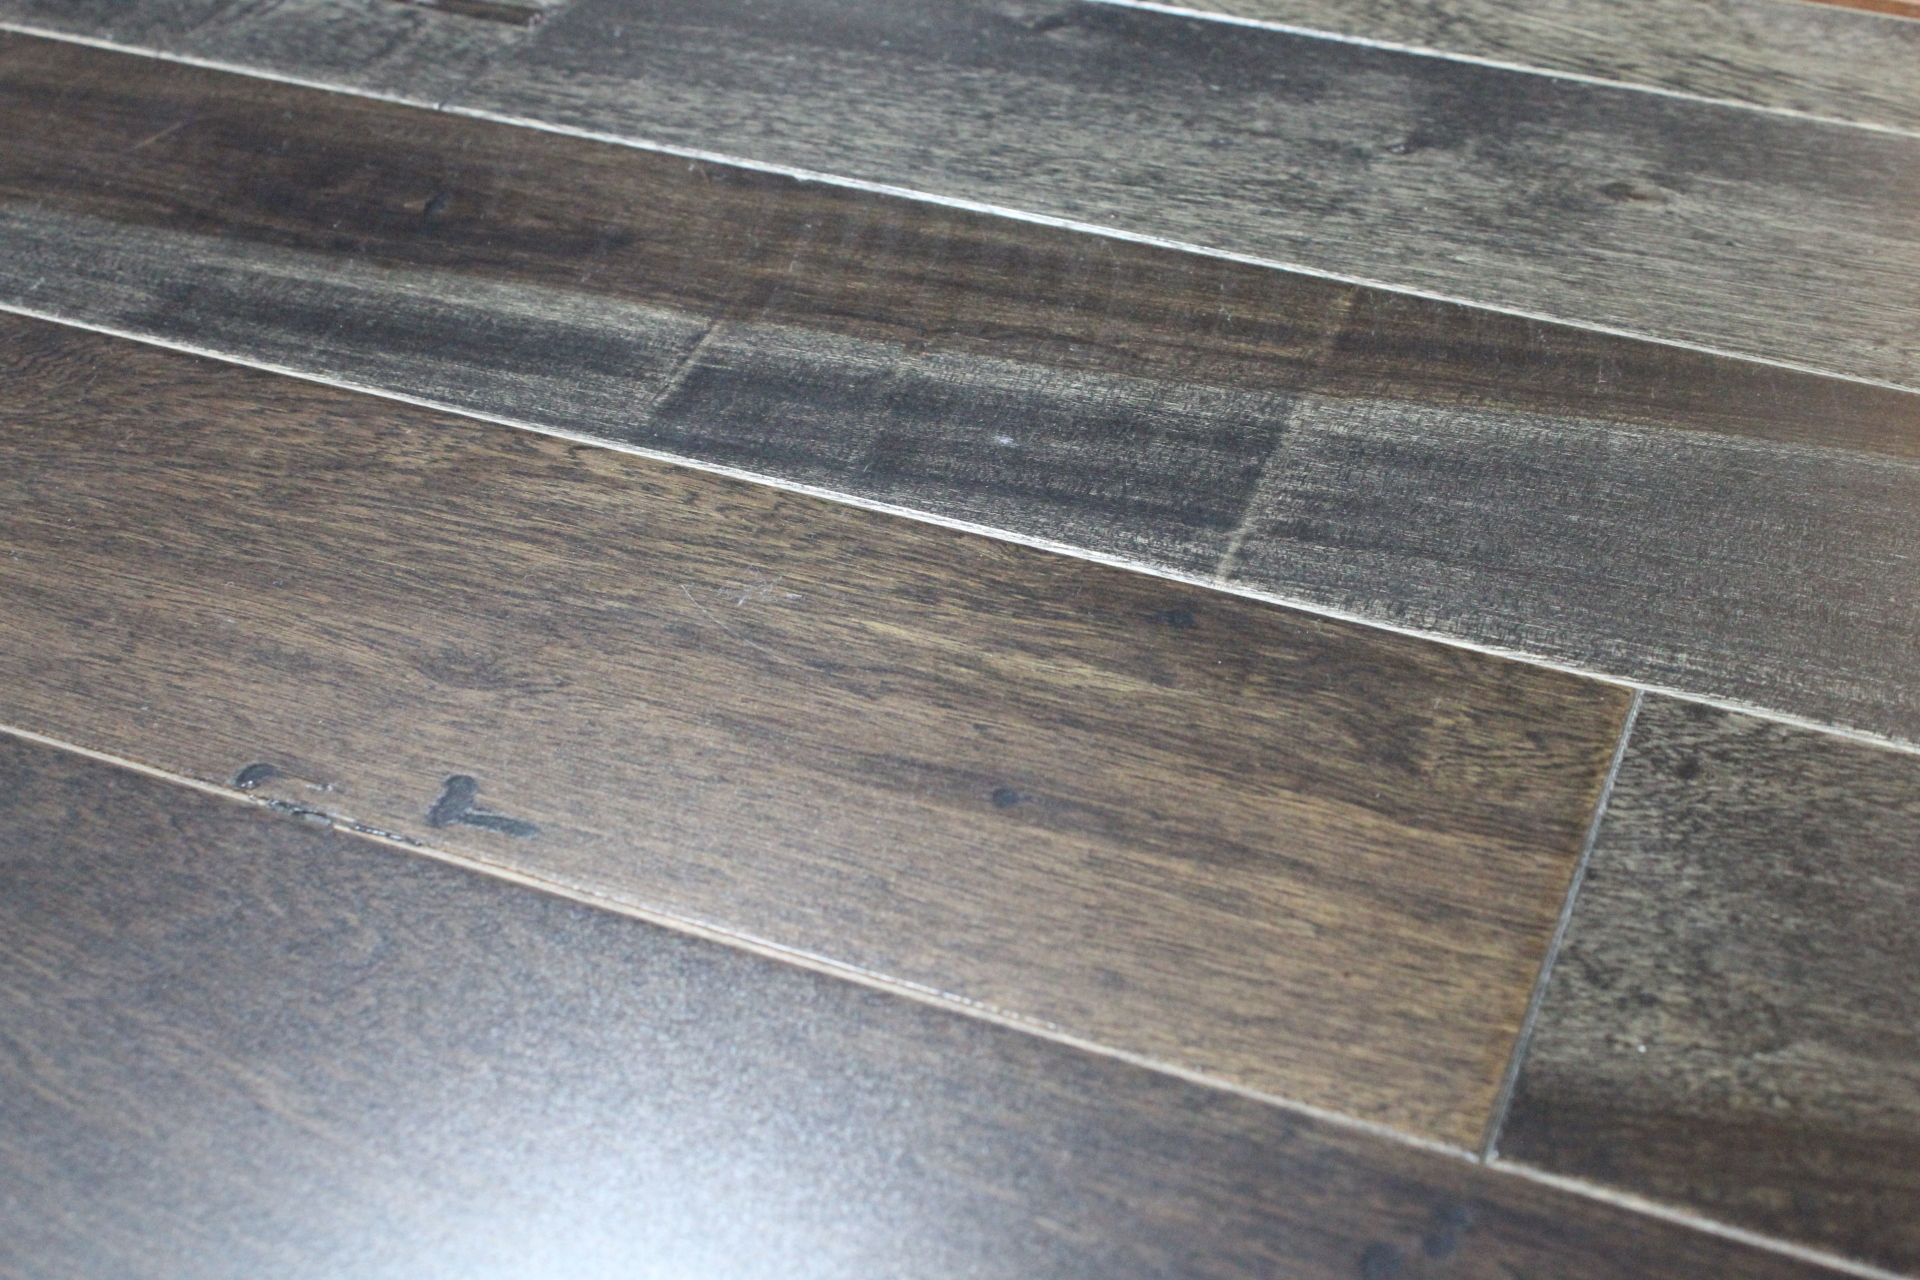 Hardwood, prefinished floor, engineered wood, solid wood, lifestyle, hard surface, prefinished hardwood, prefinished wood, home, design, interior design, wood floor design, triangulo